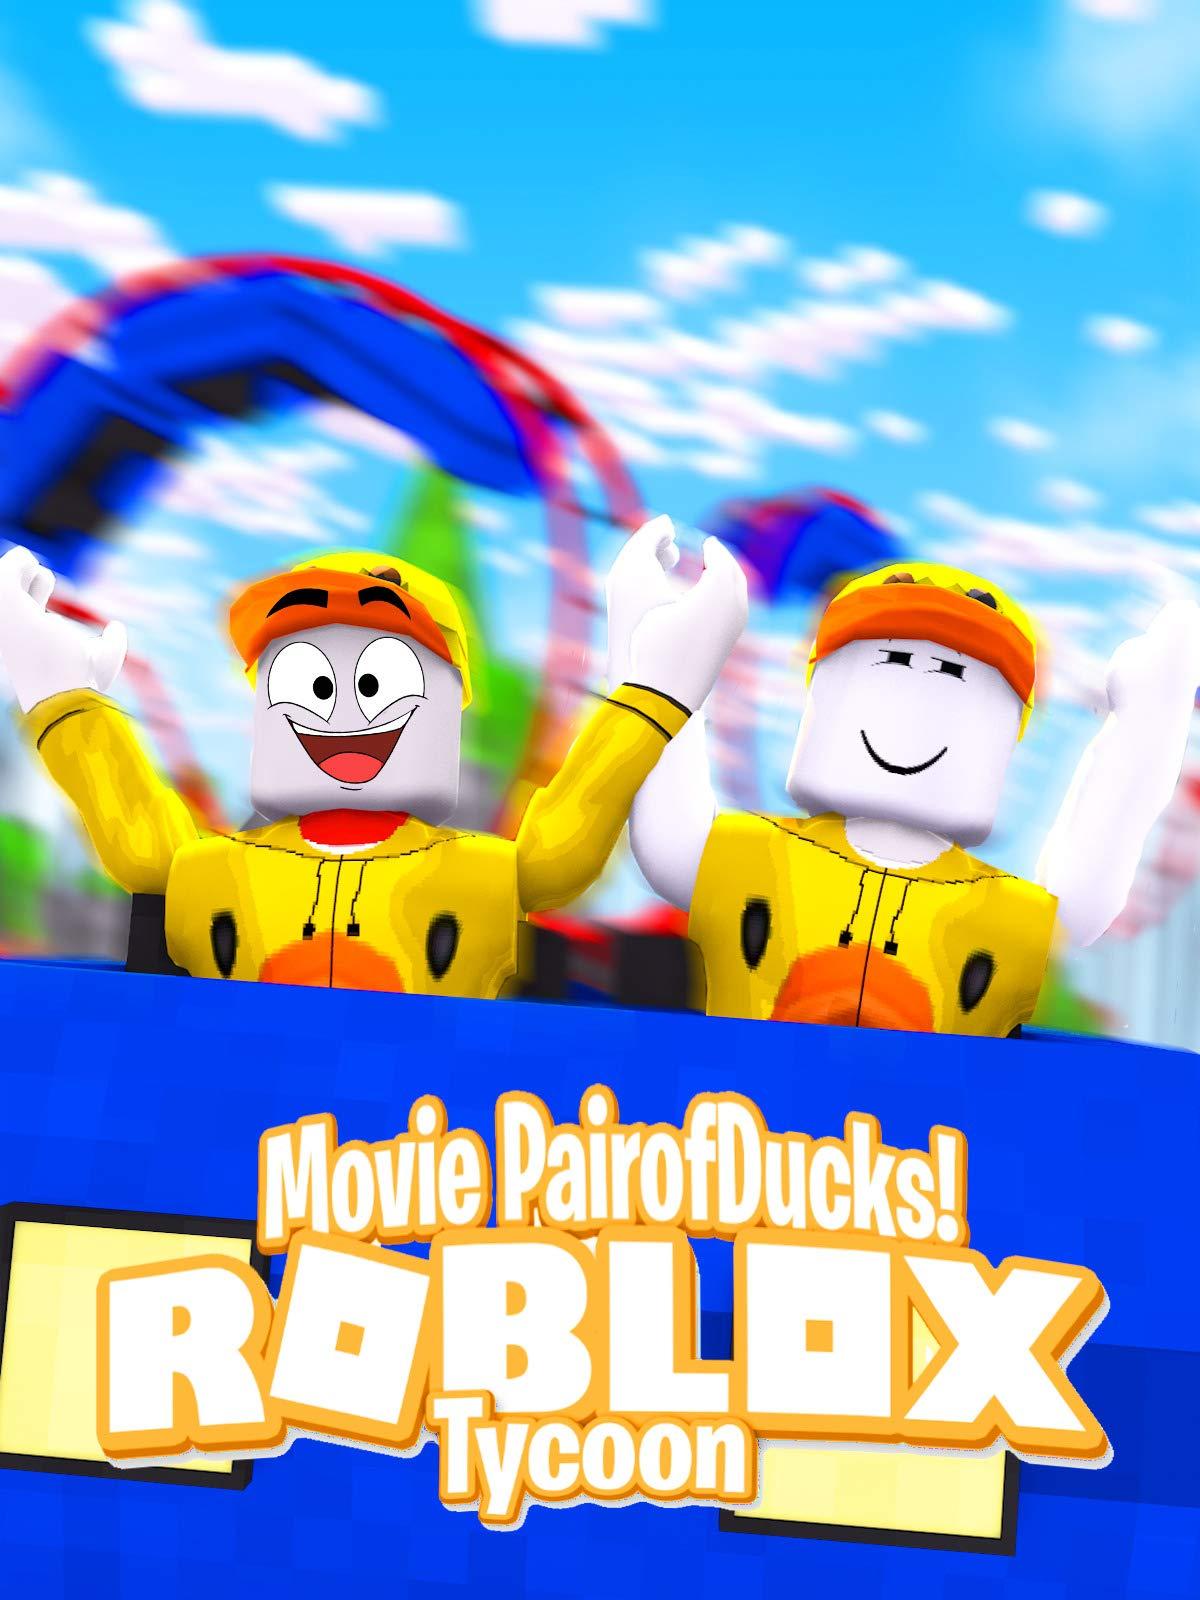 Clip: Roblox Tycoon Movie (PairofDucks)